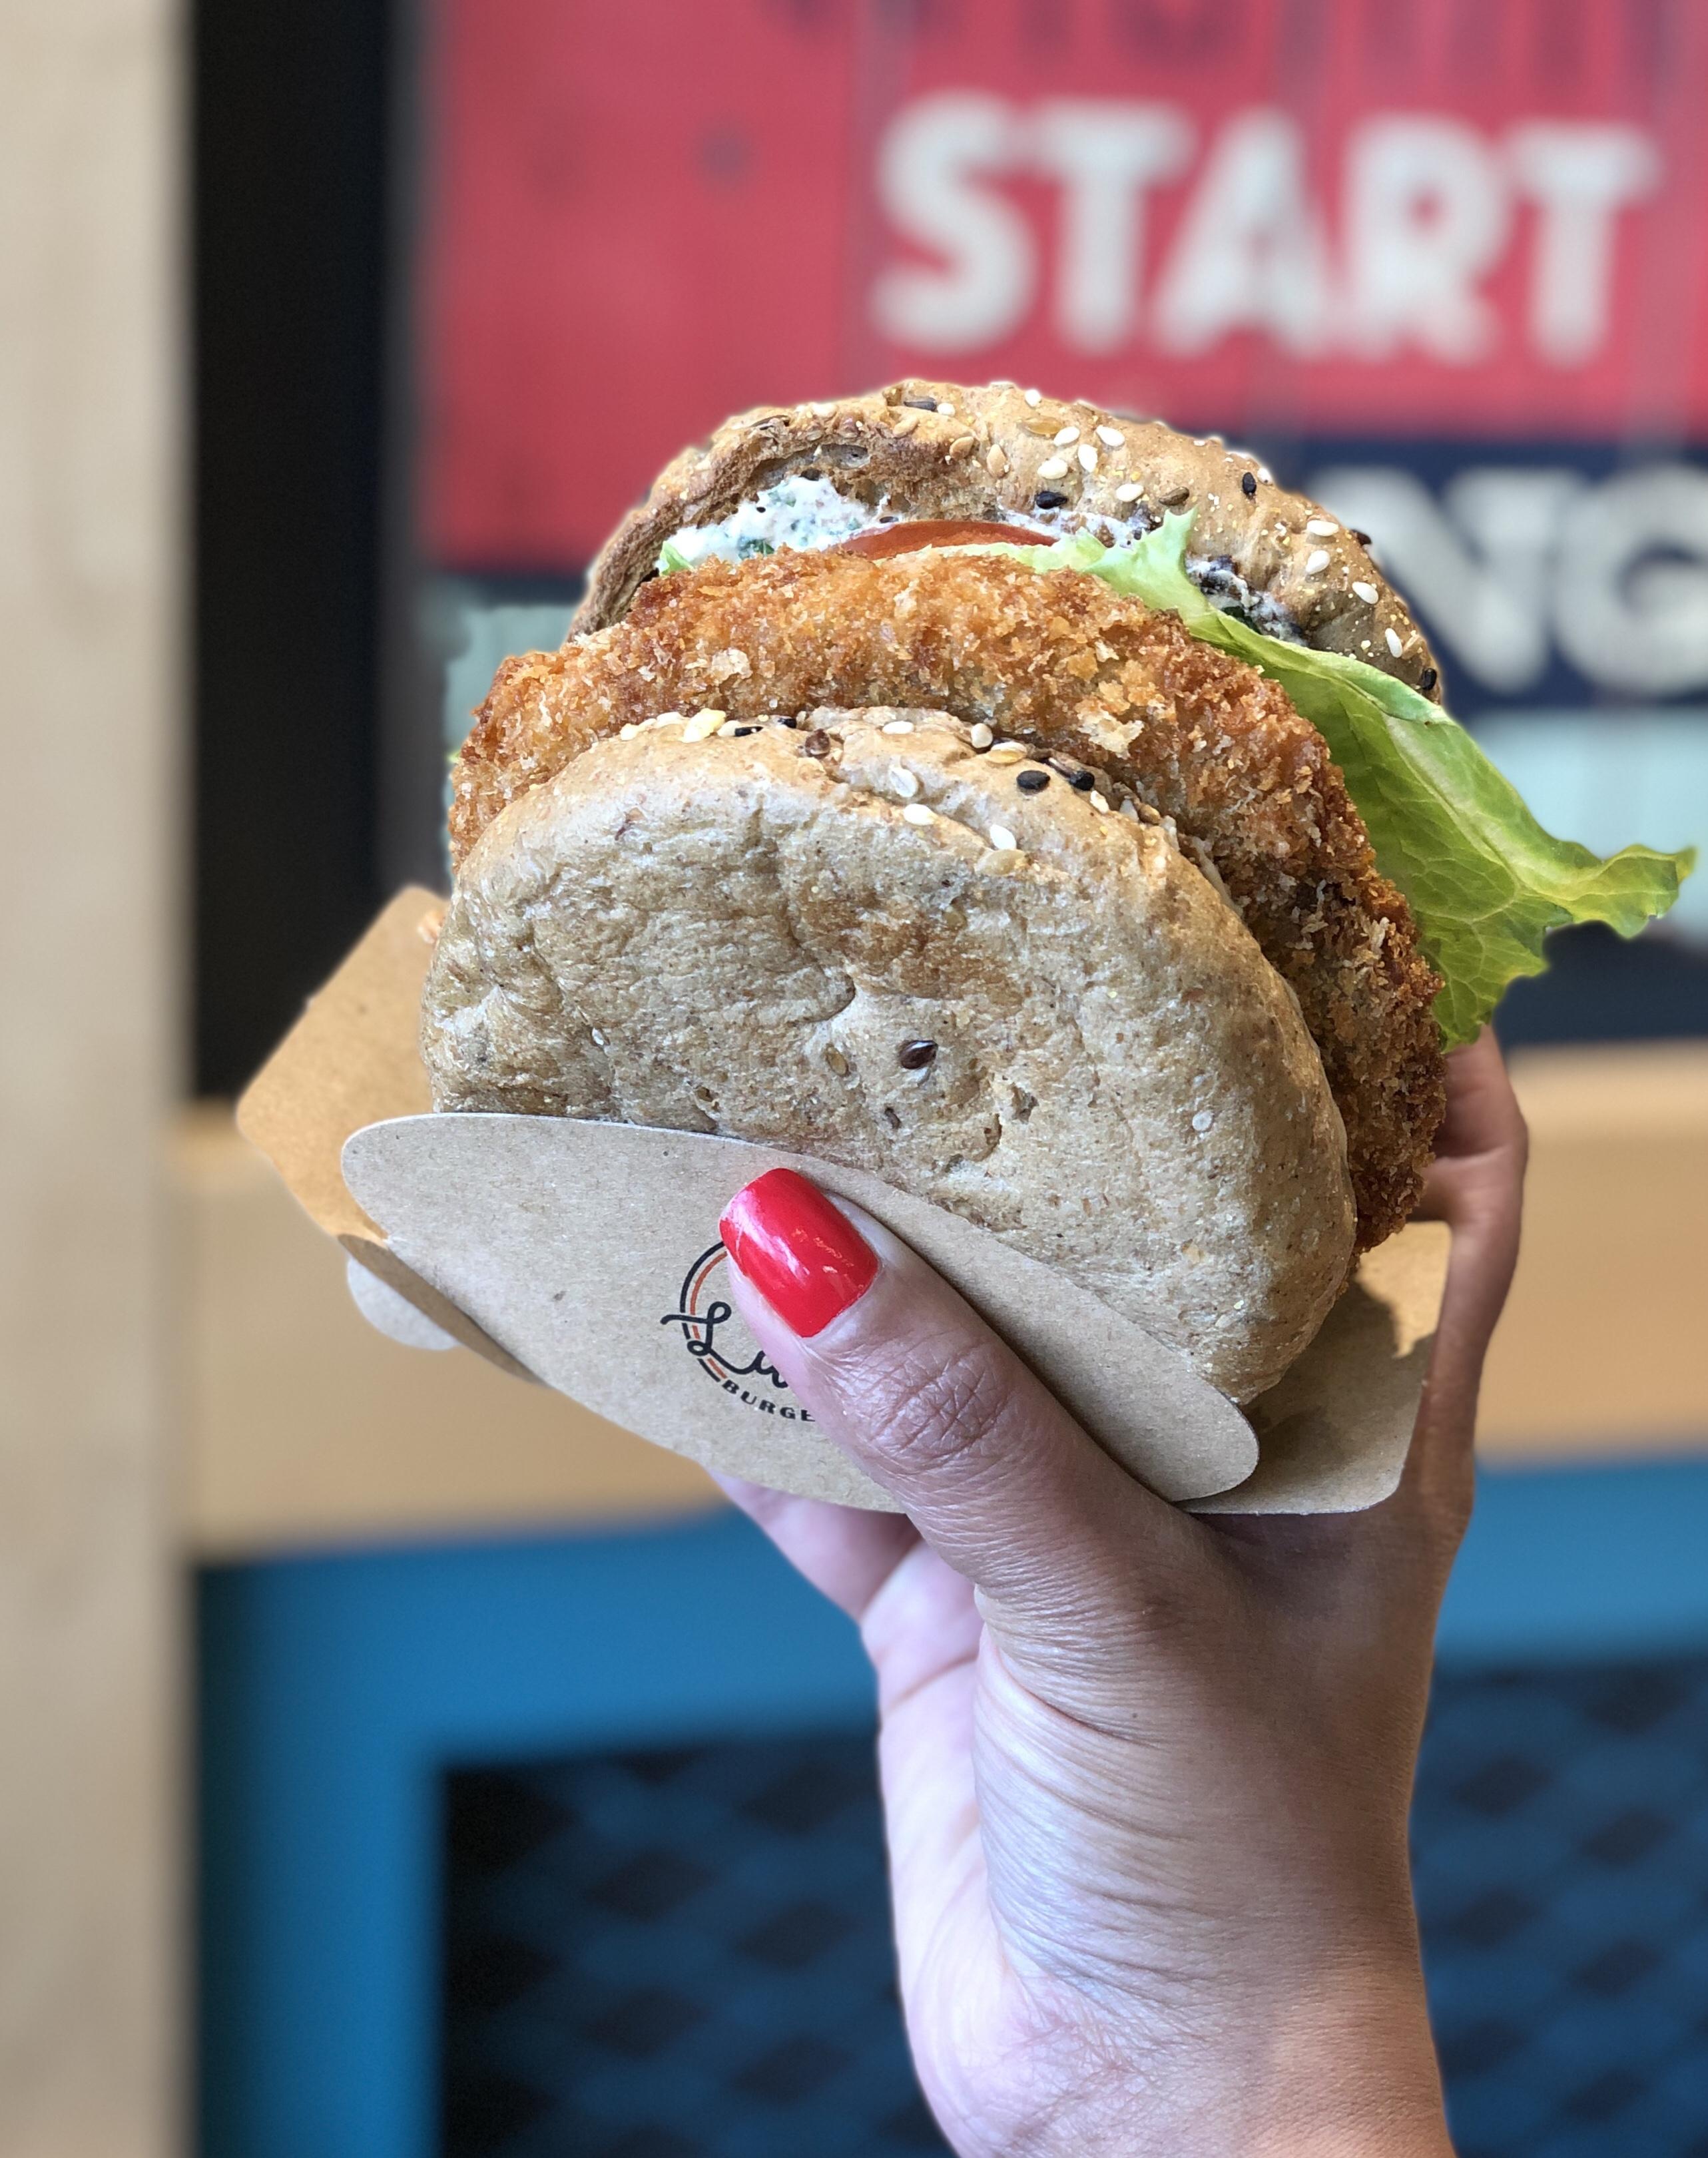 Lads Burger Dubai